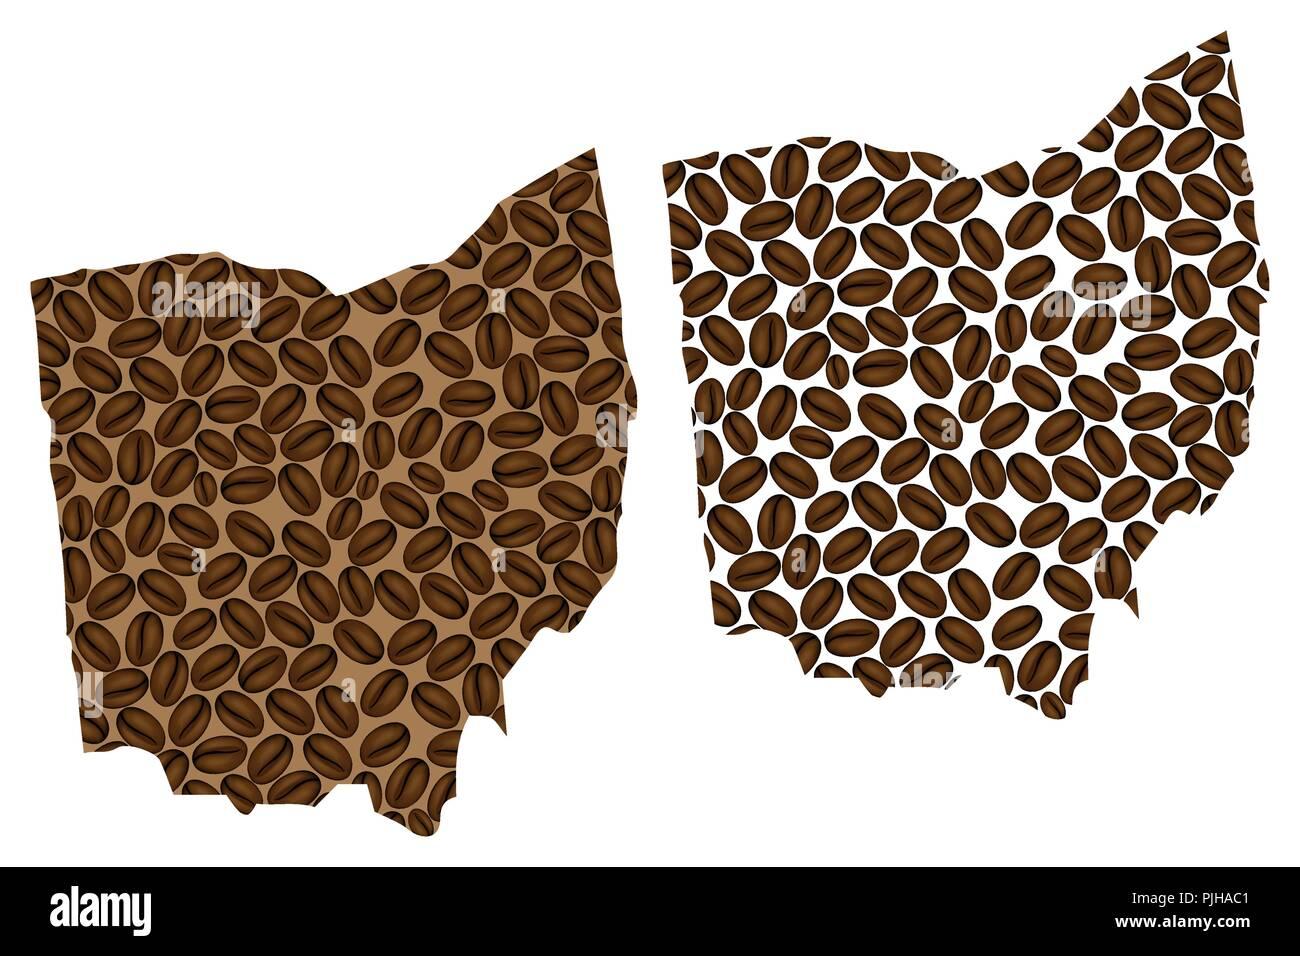 Vintage Map Ohio Stock Photos & Vintage Map Ohio Stock ... on pike ohio map, southeastern ohio map, northfield ohio map, south bass island ohio map, white cottage ohio map, stark ohio map, sandusky minnesota map, flint ohio map, ohio county map, wapakoneta ohio map, st bernard ohio map, east canton ohio map, pleasant ridge ohio map, boise ohio map, alliance ohio map, lawrence ohio map, ohio on us map, ohio ohio map, parma hts ohio map, destination point map,